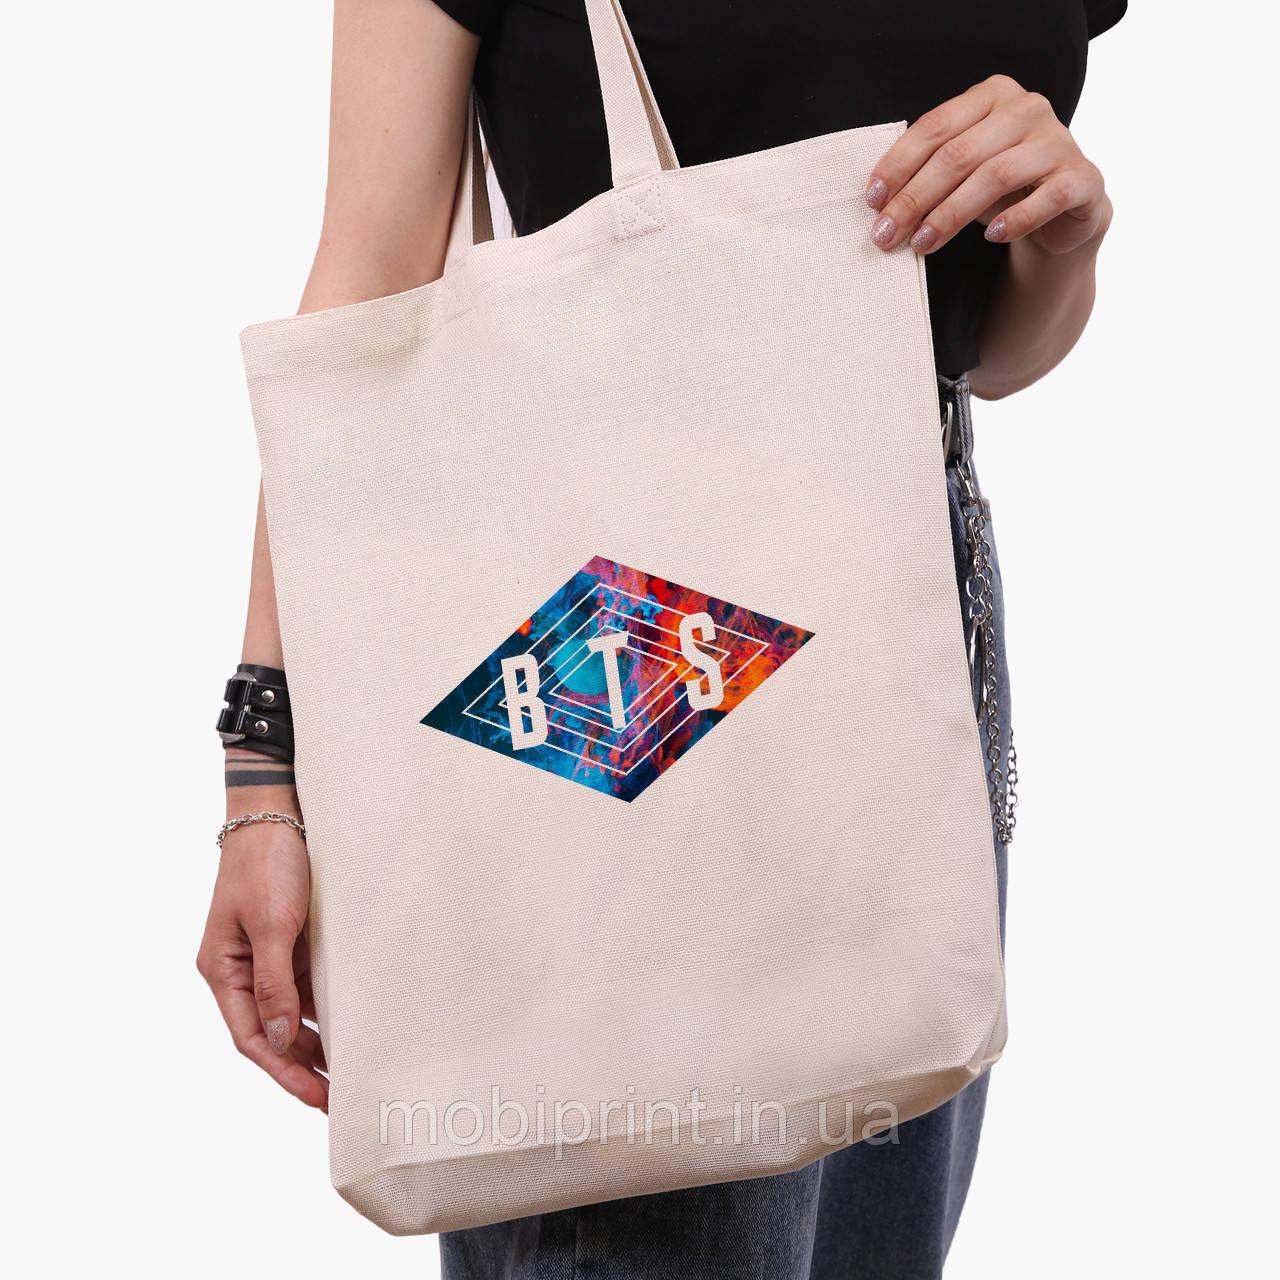 Еко сумка шоппер біла БТС (BTS) (9227-1062-1) экосумка шопер 41*39*8 см